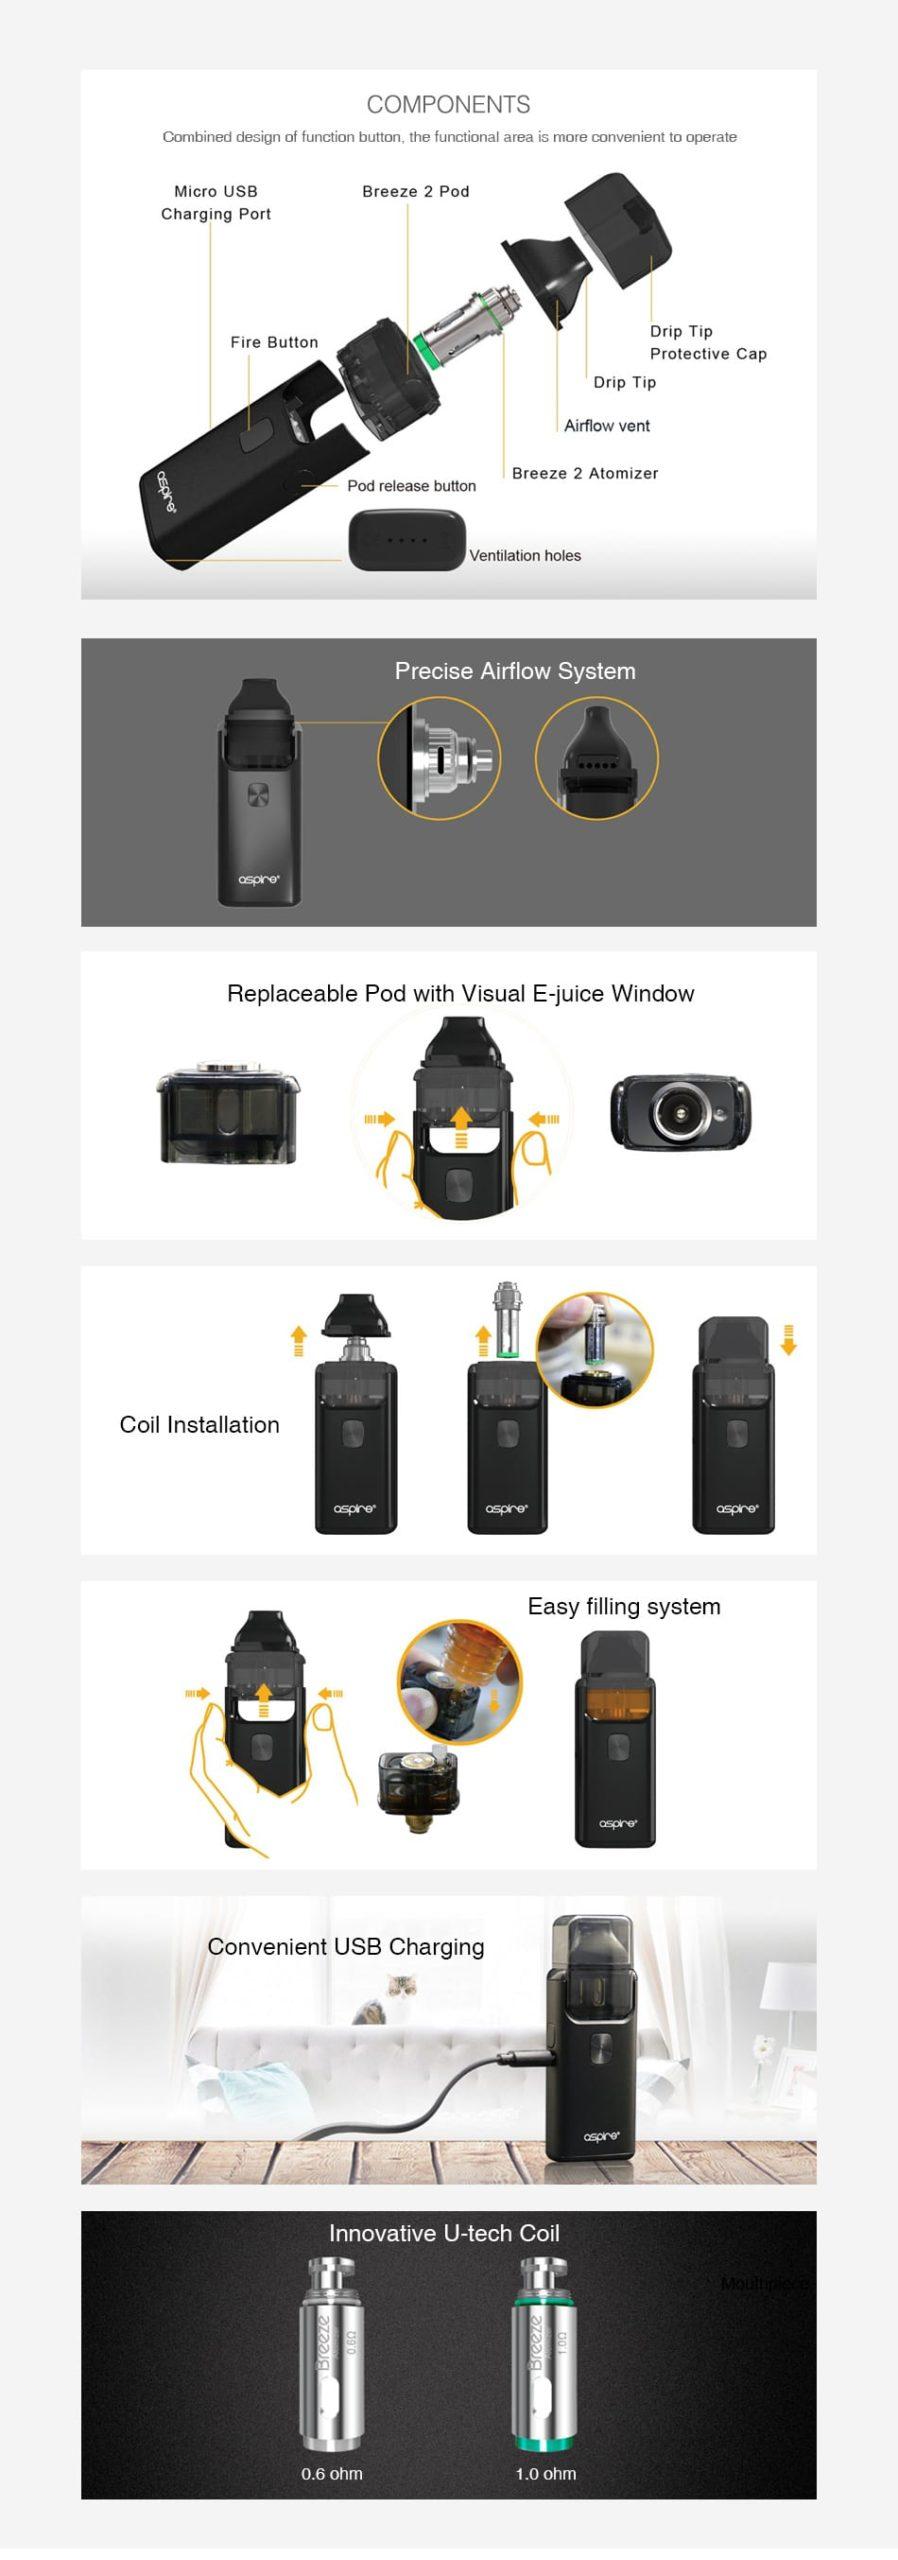 Aspire Breeze 2 AIO 2ml Starter Kit 1000mAh